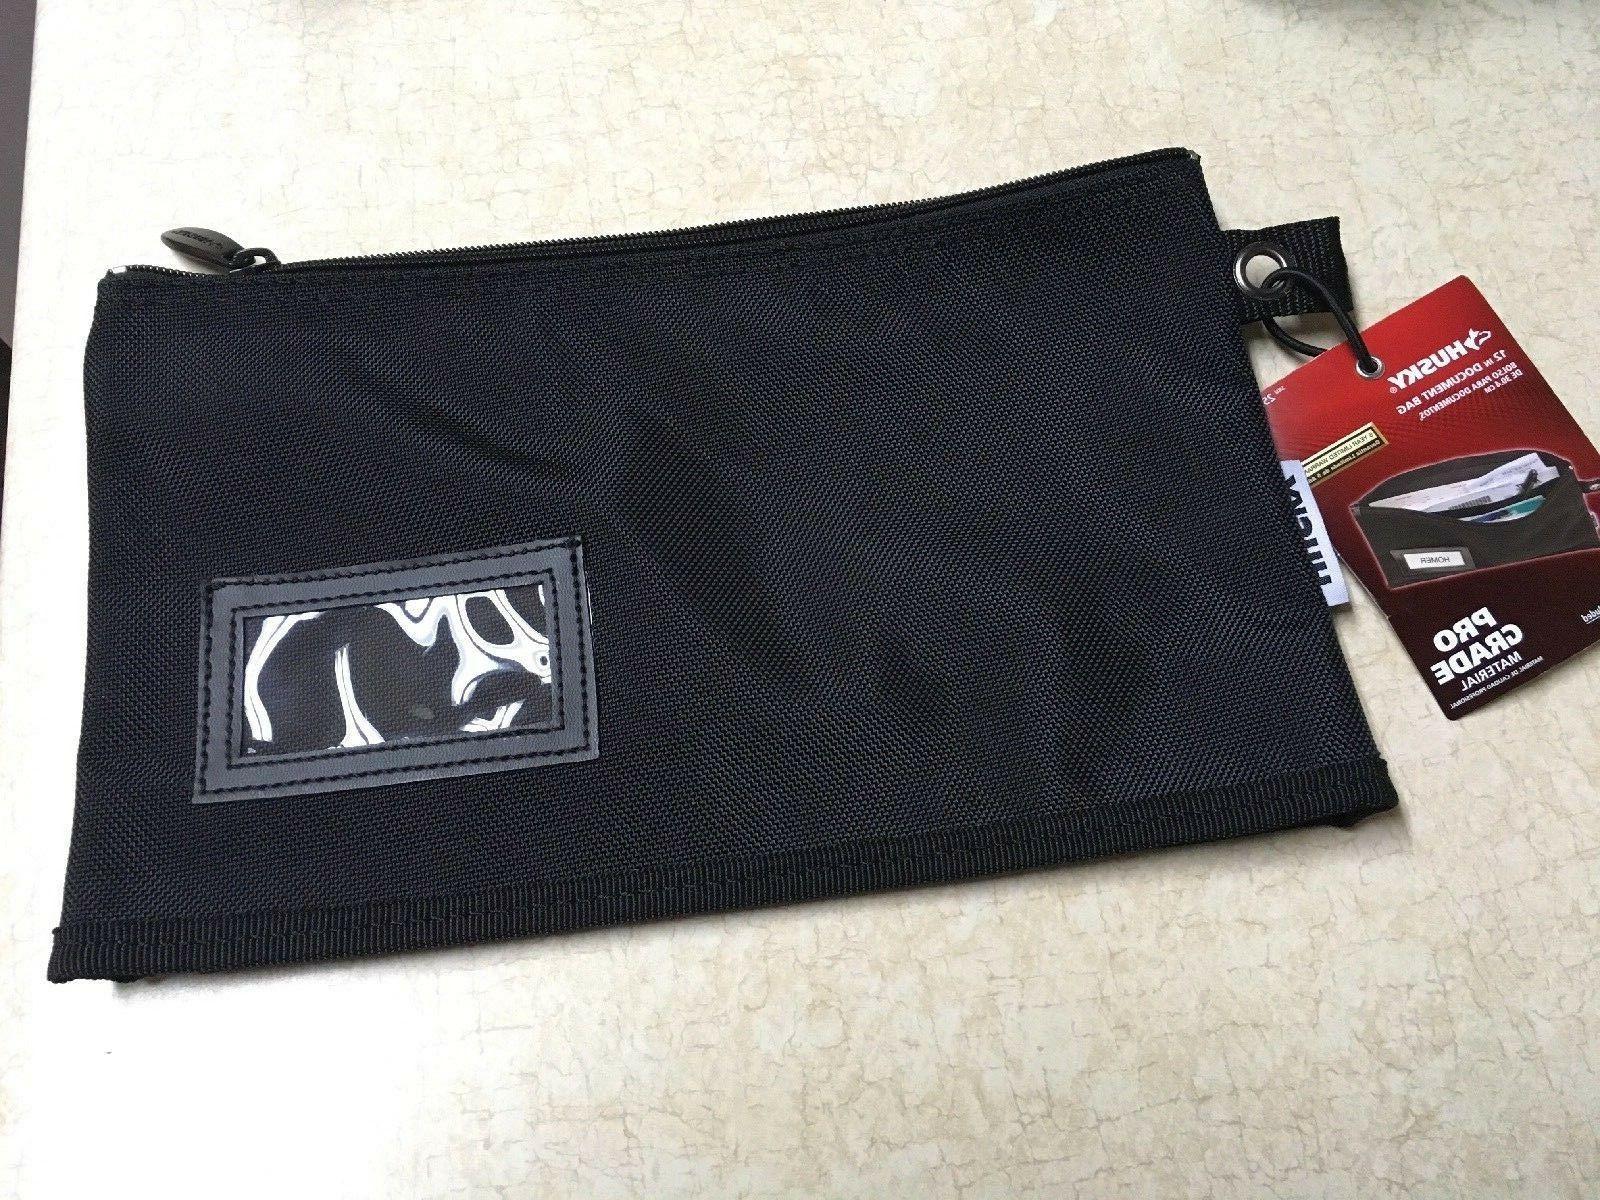 Husky Heavy Document Money Bag Zipper Resist inches Pro